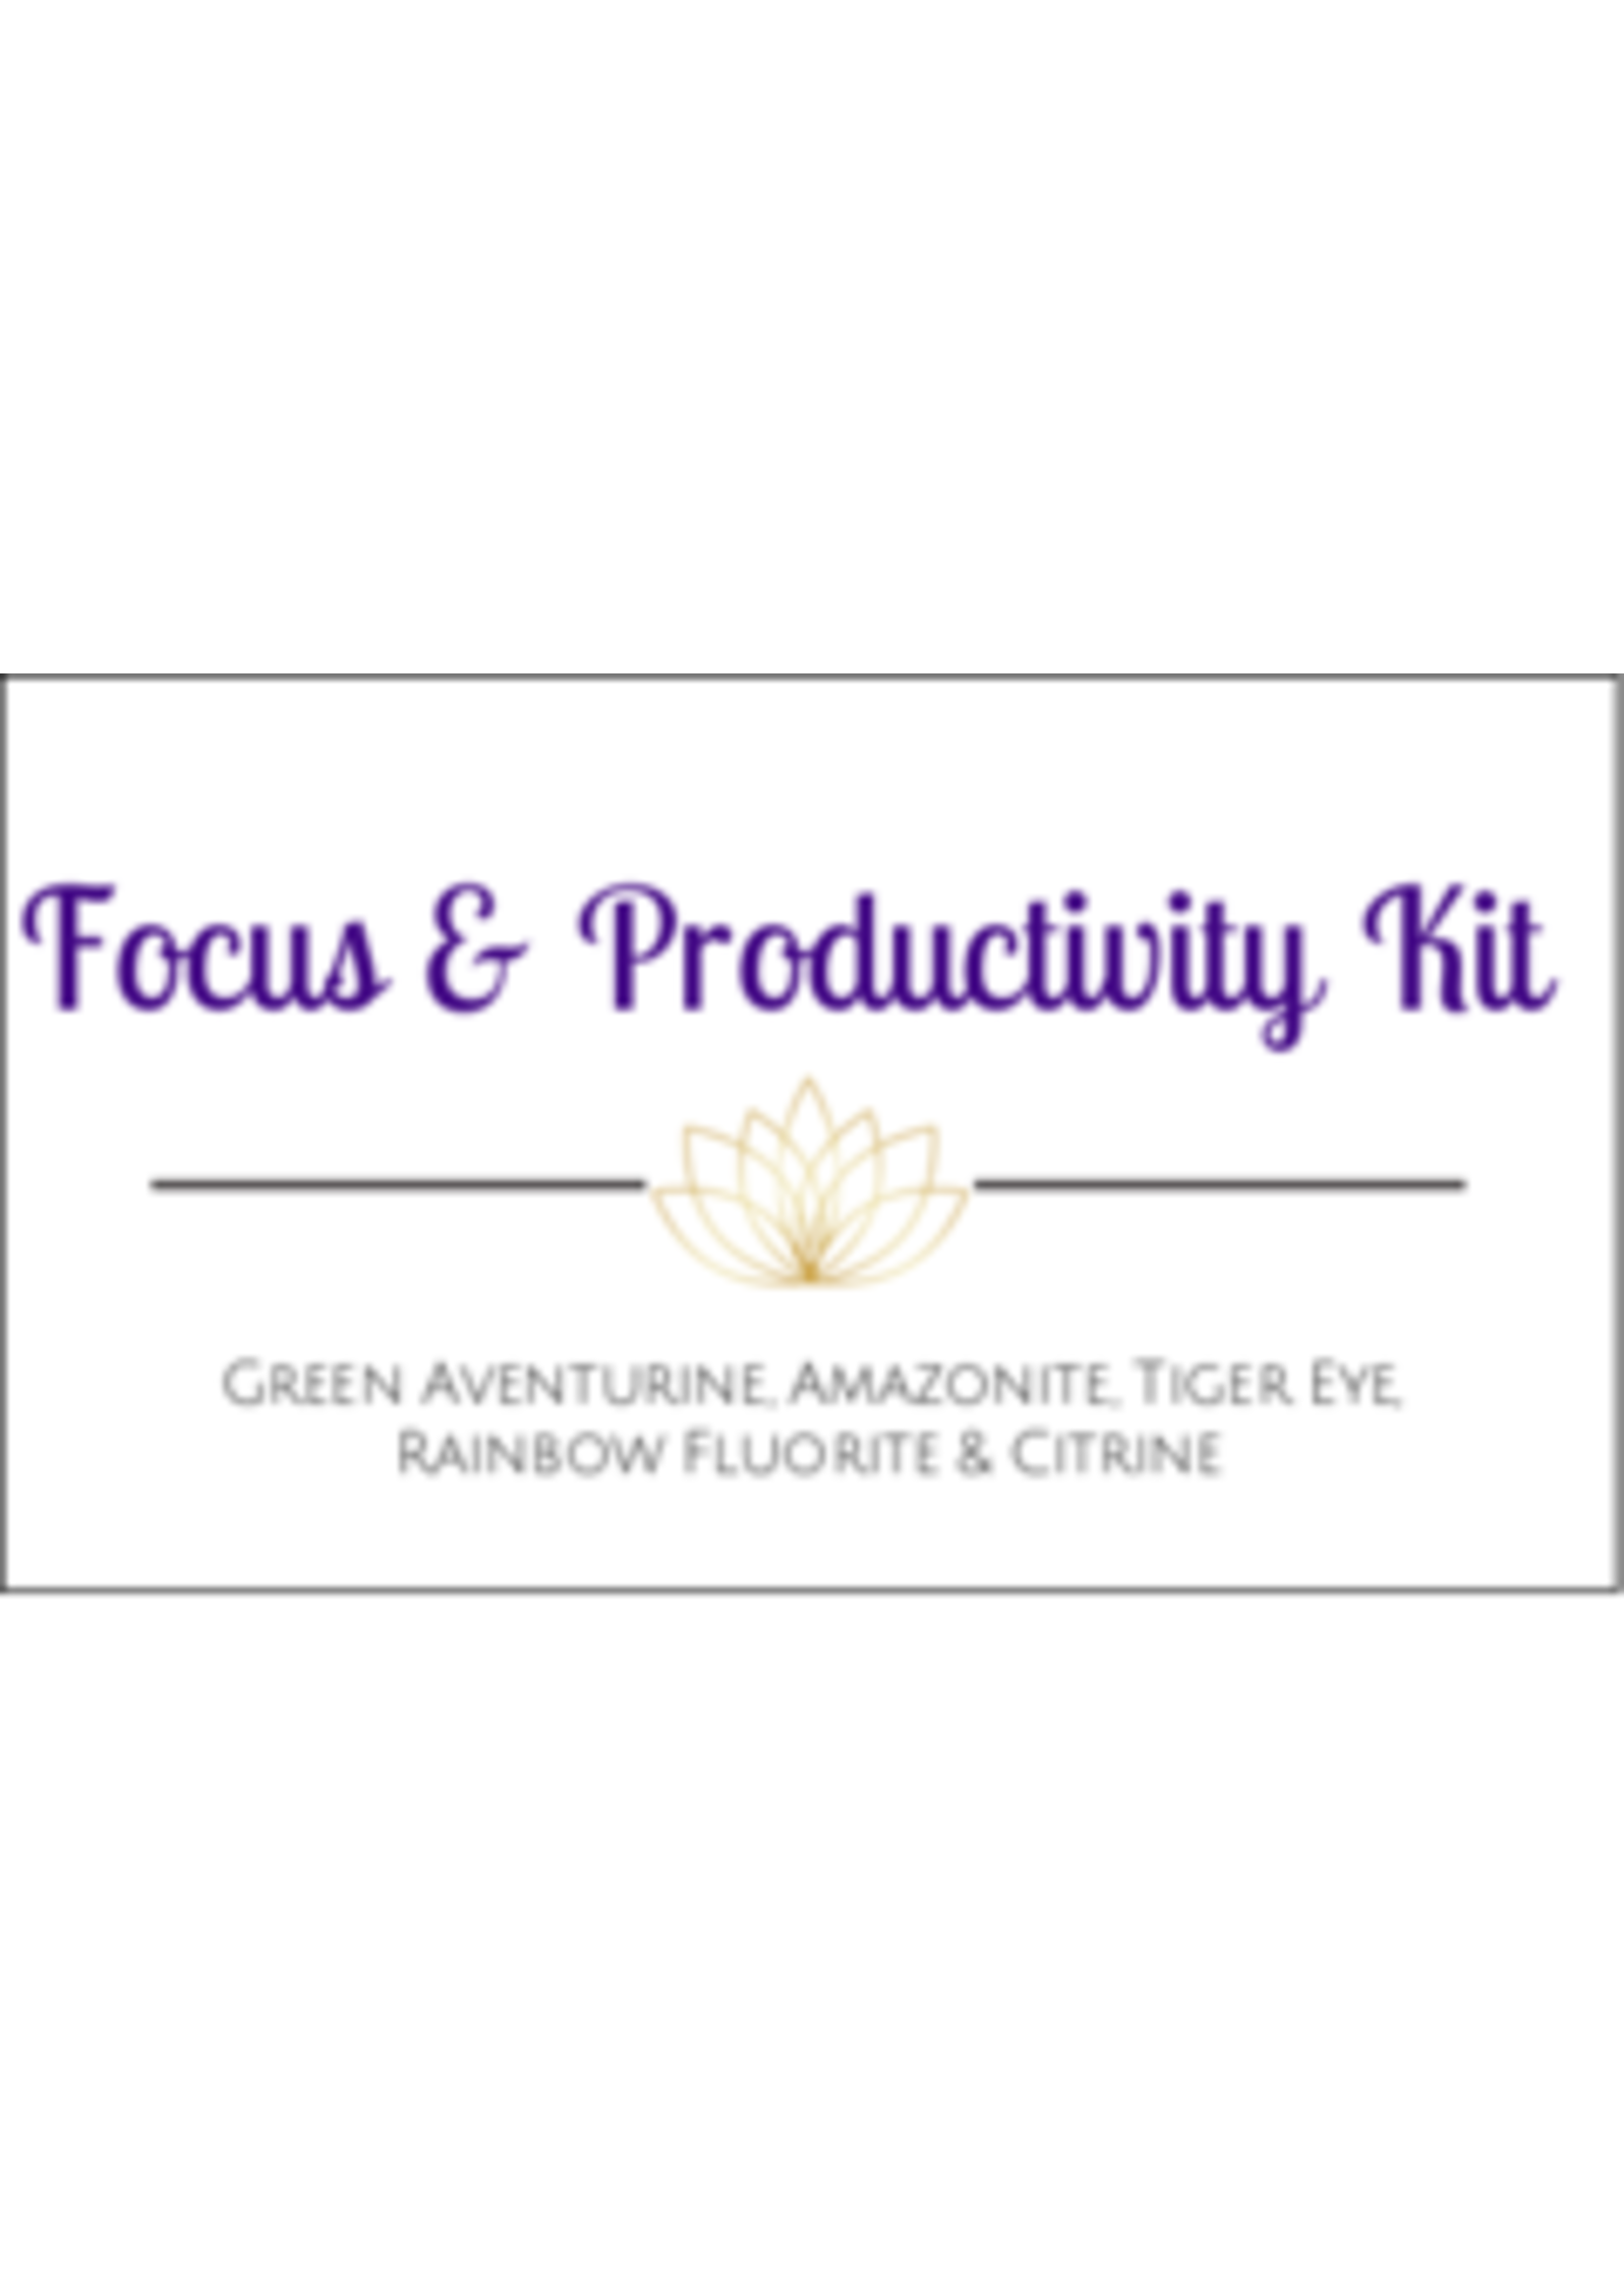 Focus & Productivity Crystal Kit Cards - Box of 100